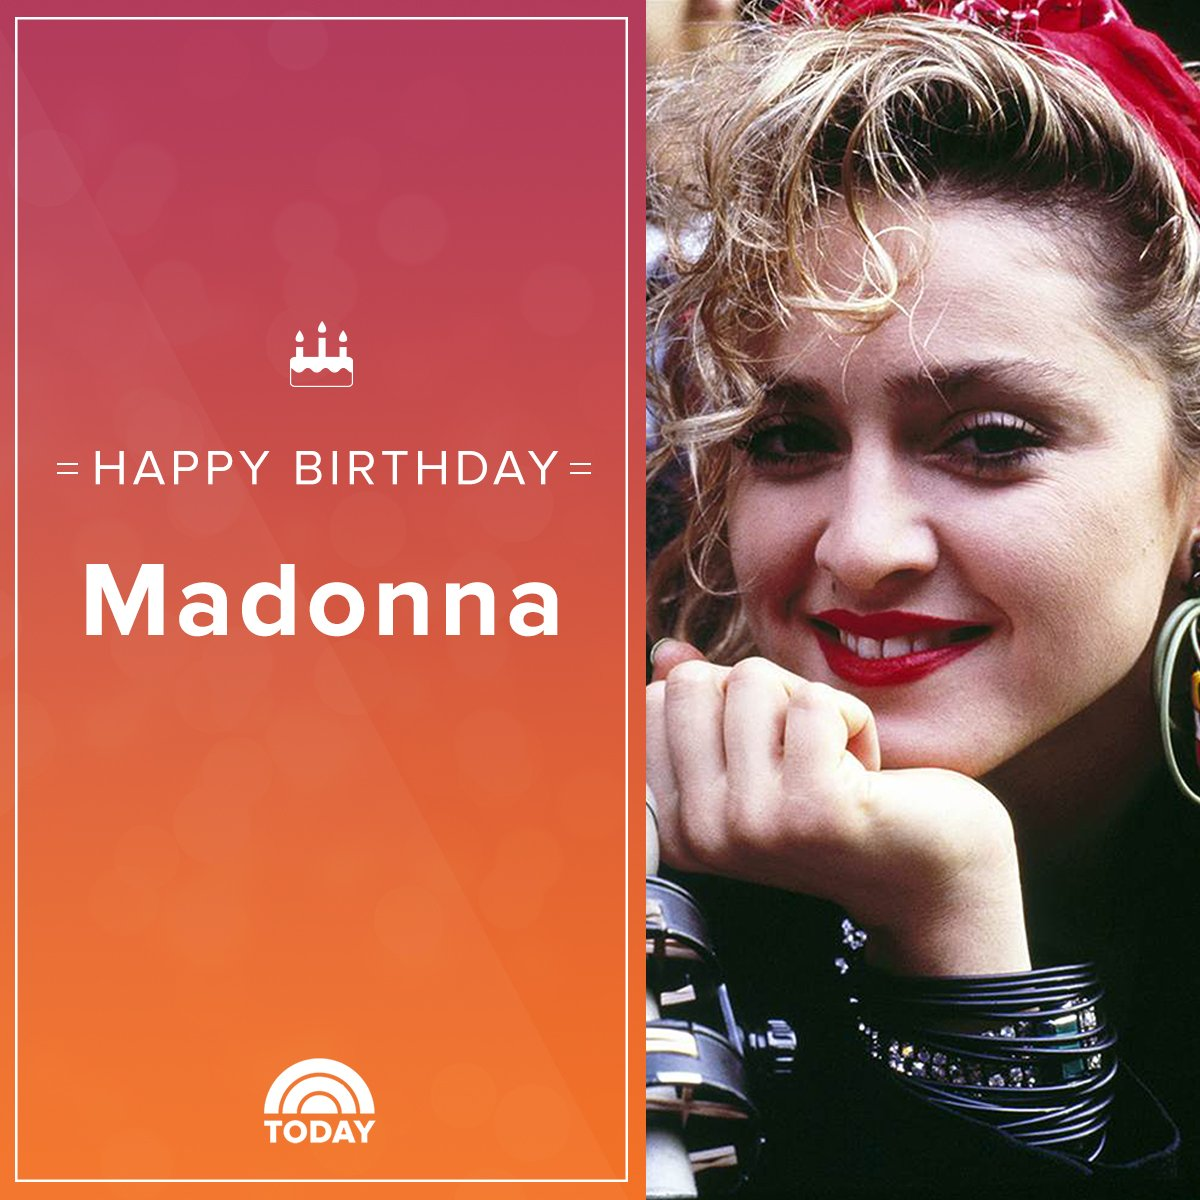 Happy 60th birthday, Madonna!